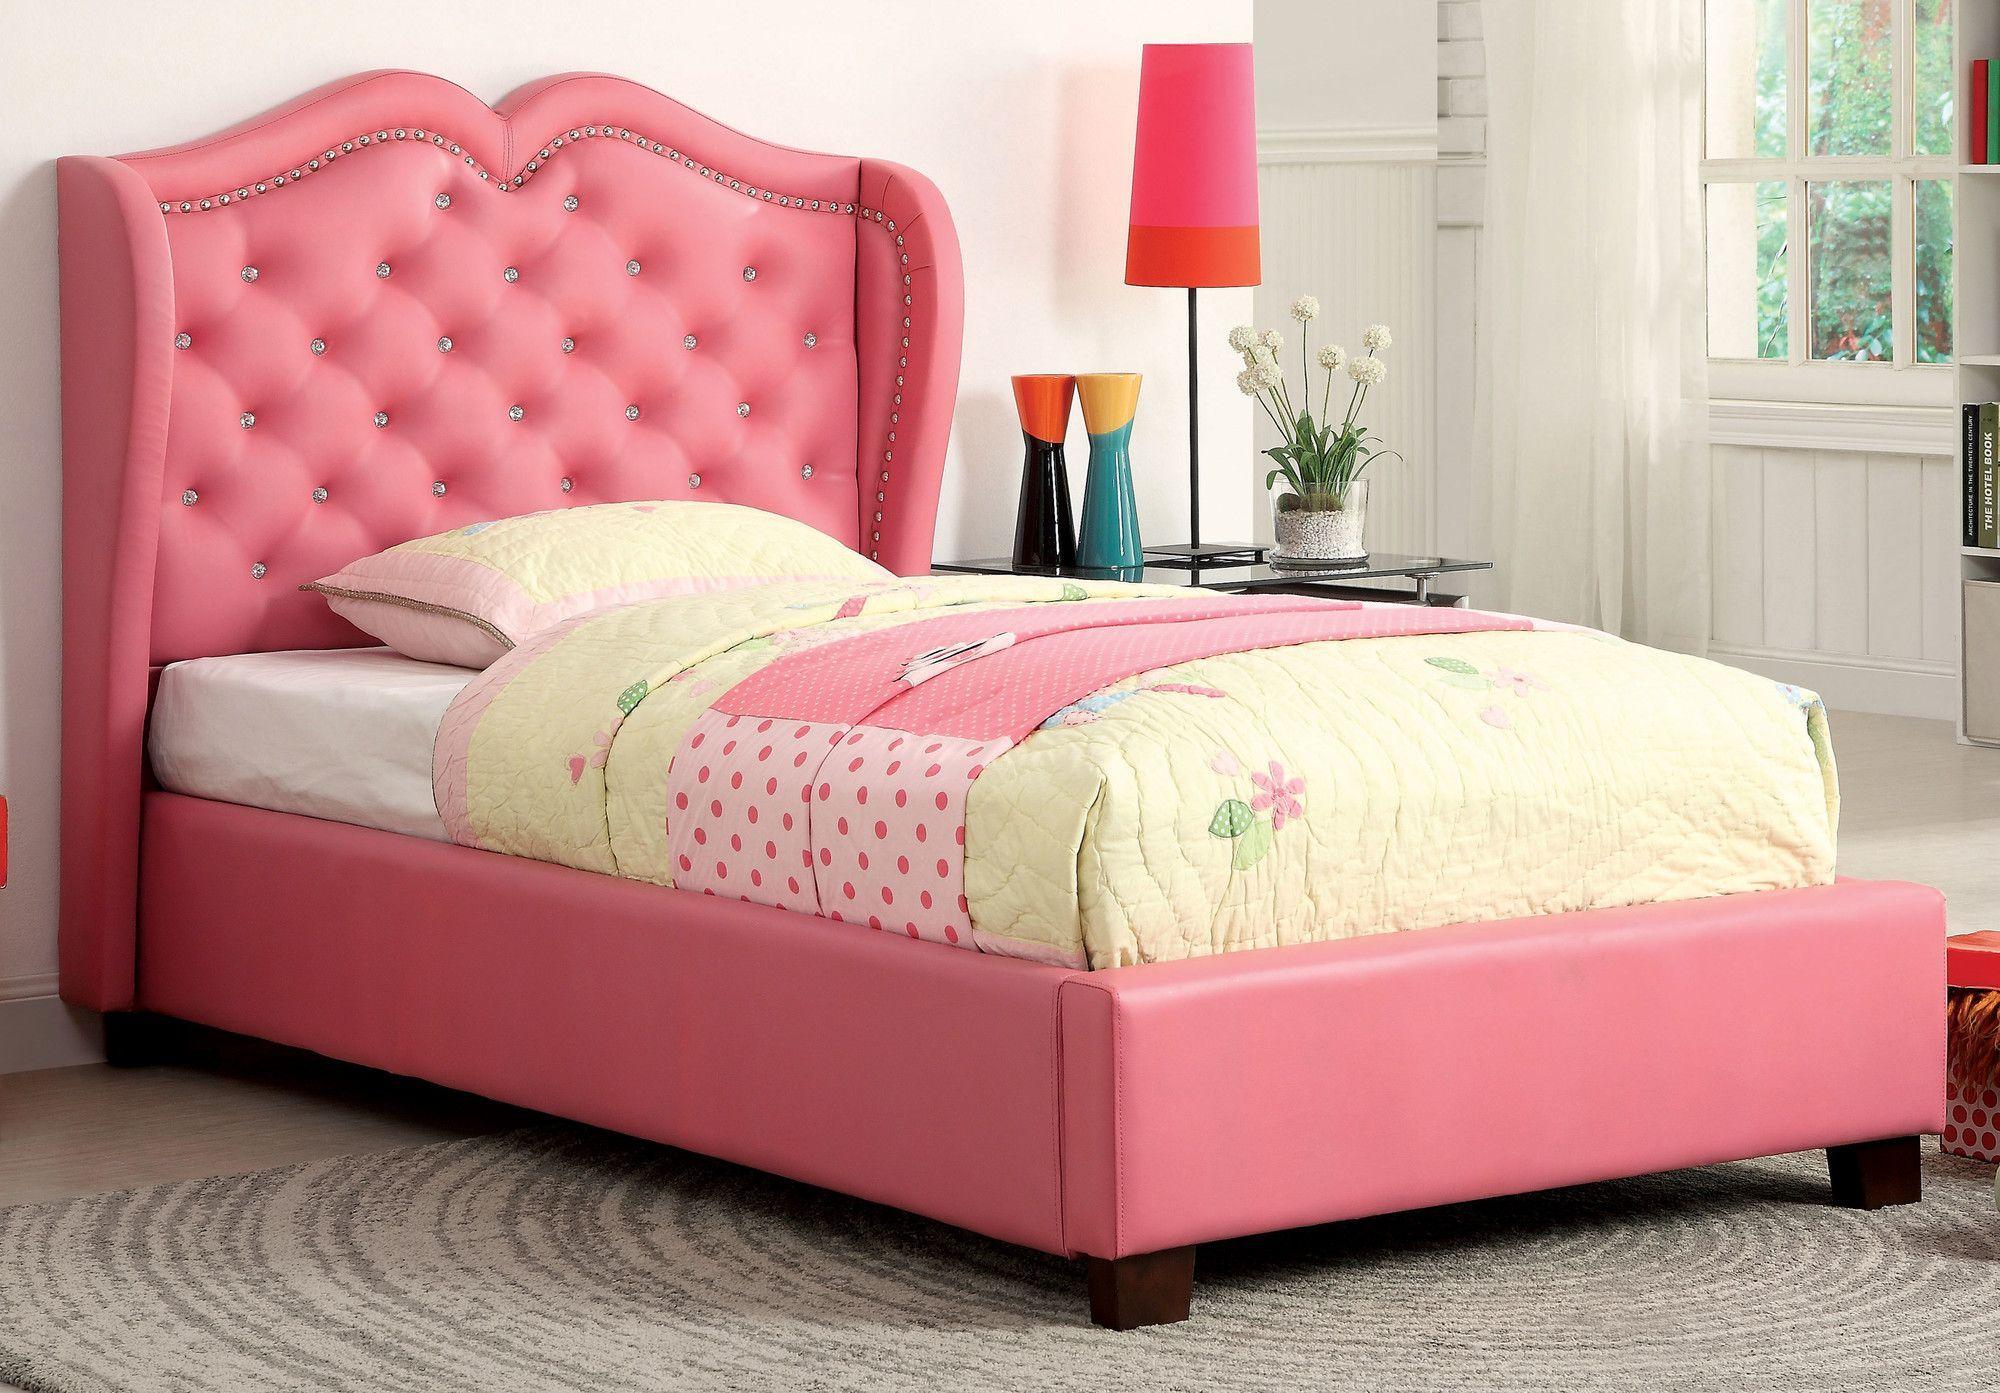 Hokku Designs Vanitas Panel Bed Leather Upholstered Bed Upholstered Beds Nailhead Trim Bed